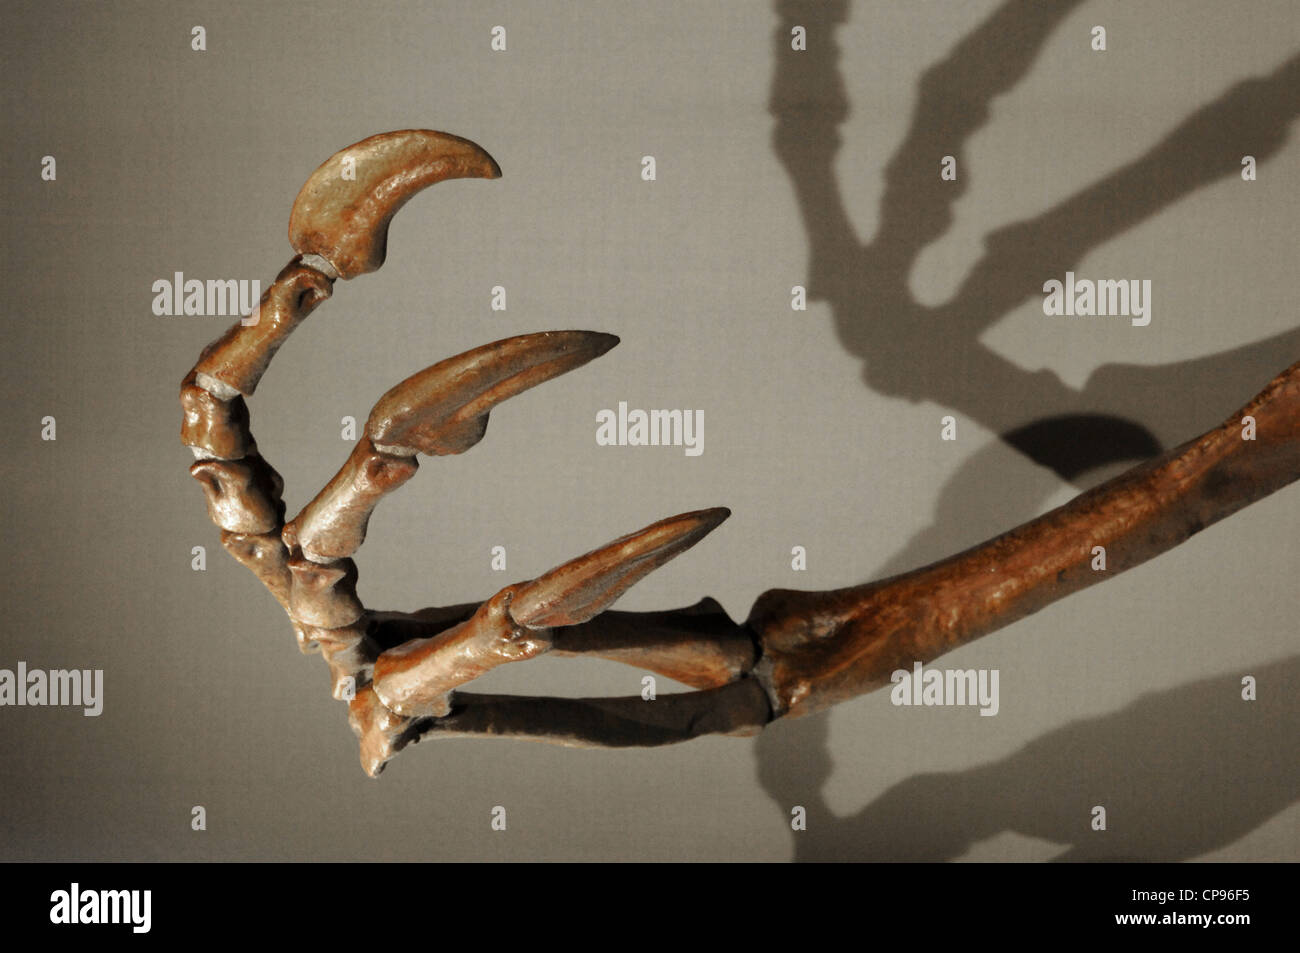 Pata delantera del Deinocheirus (Deinocheirus mirificus). Cretácico Superior. Etapa maastrichtiana. Imagen De Stock